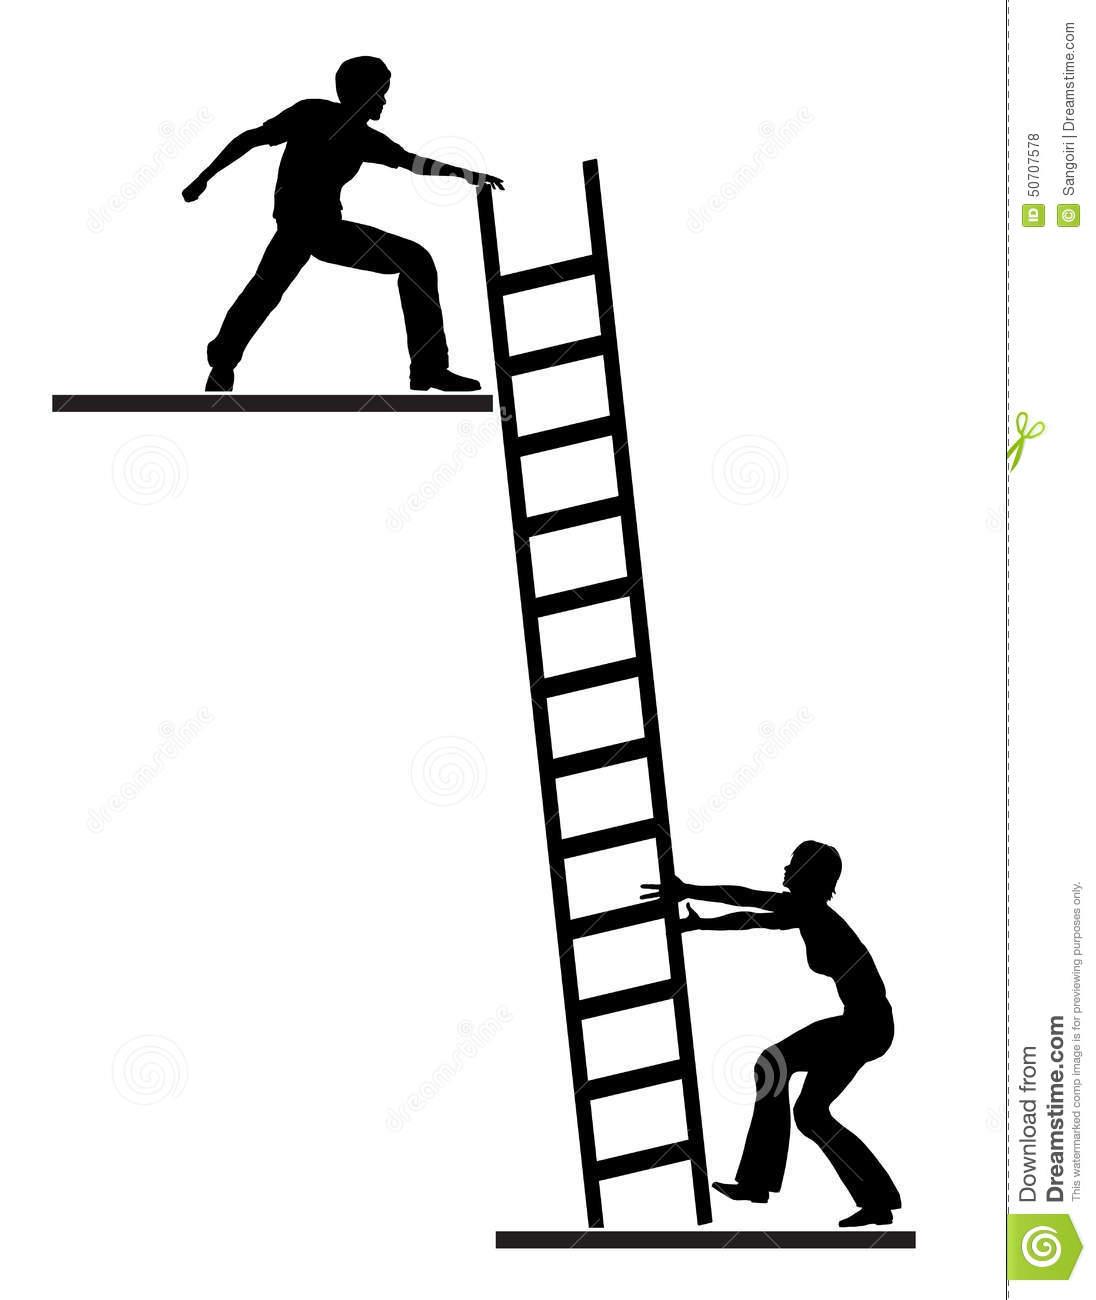 Clipart Climbing Laddar Silhouette